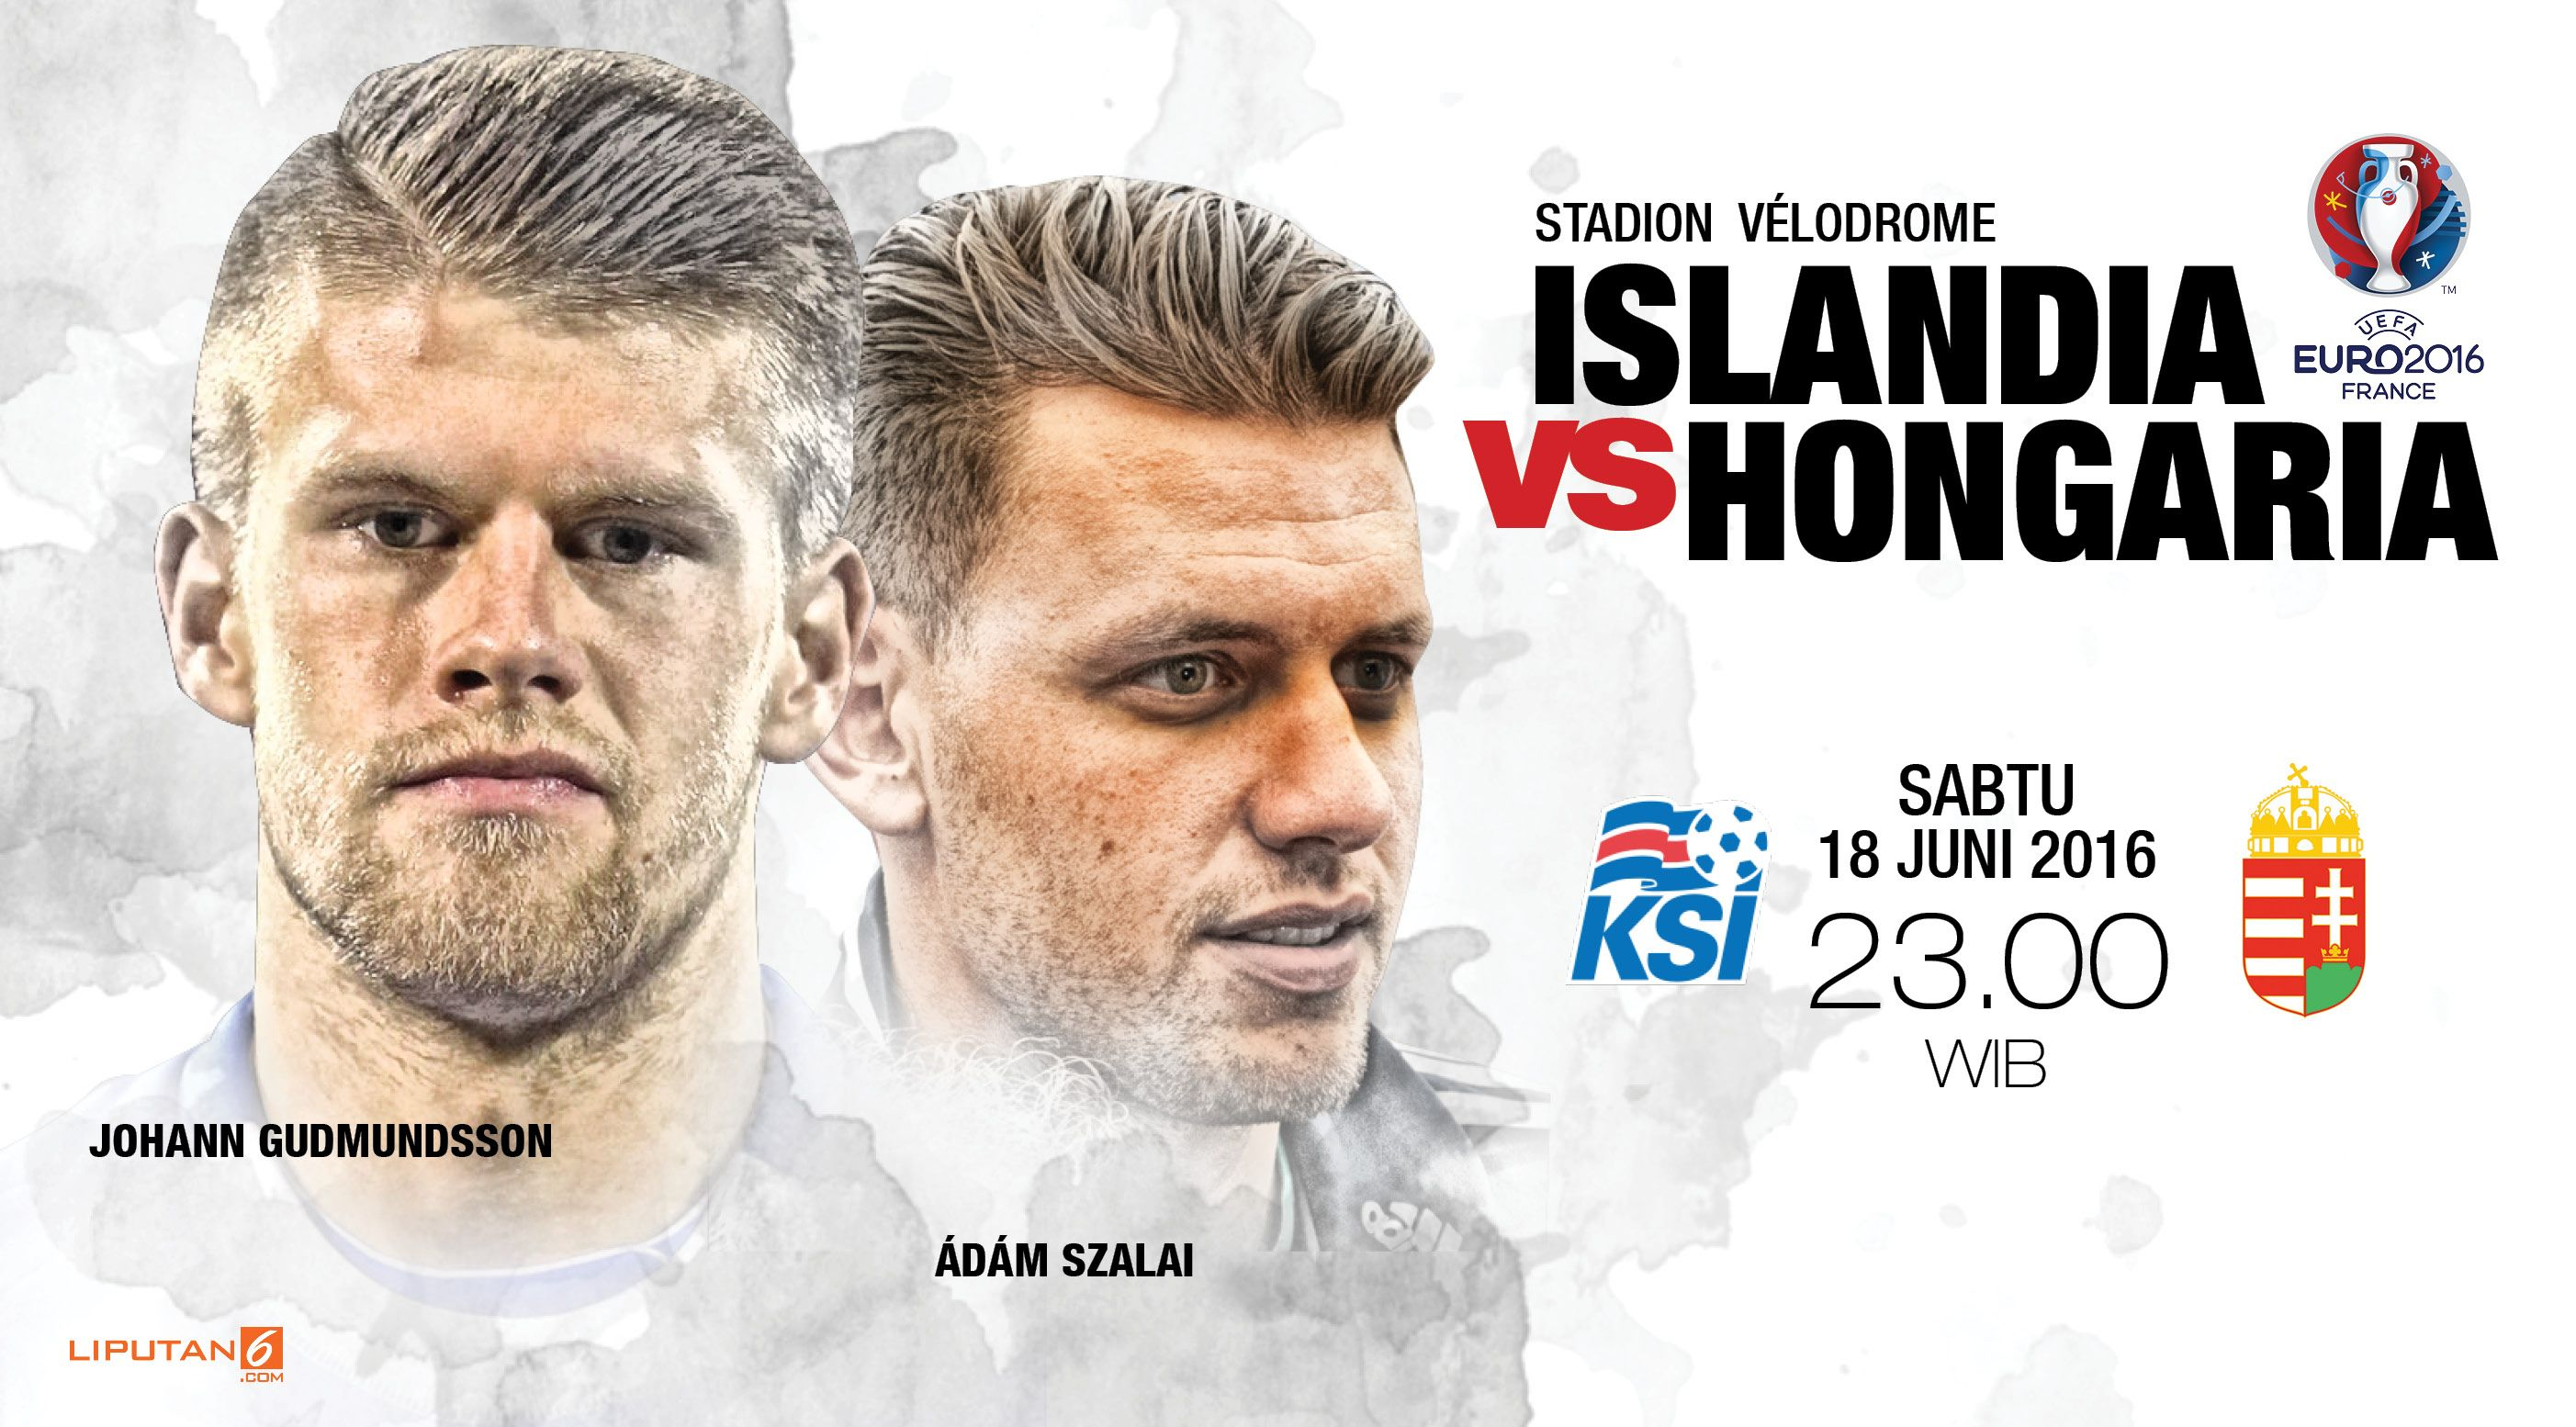 Islandia vs Hongaria design: (Liputan6.com/Abdillah)